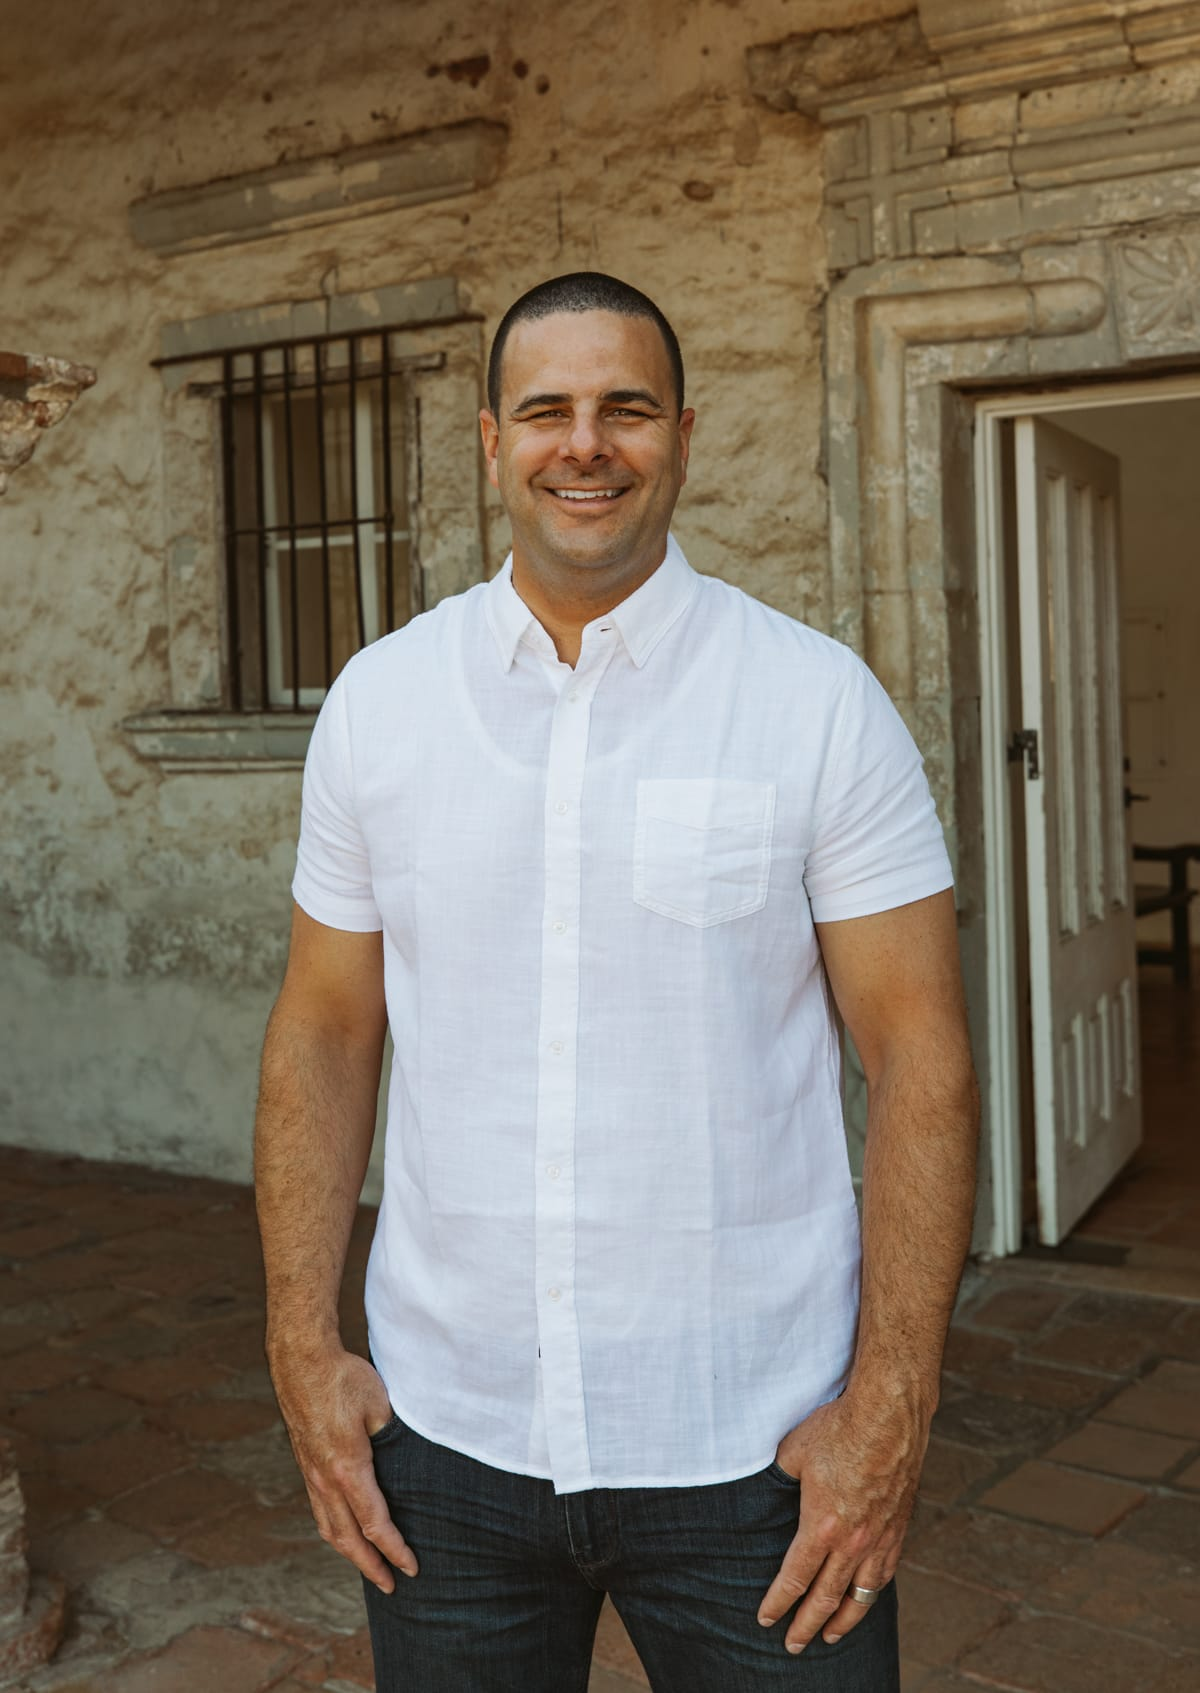 white button down shirt for men